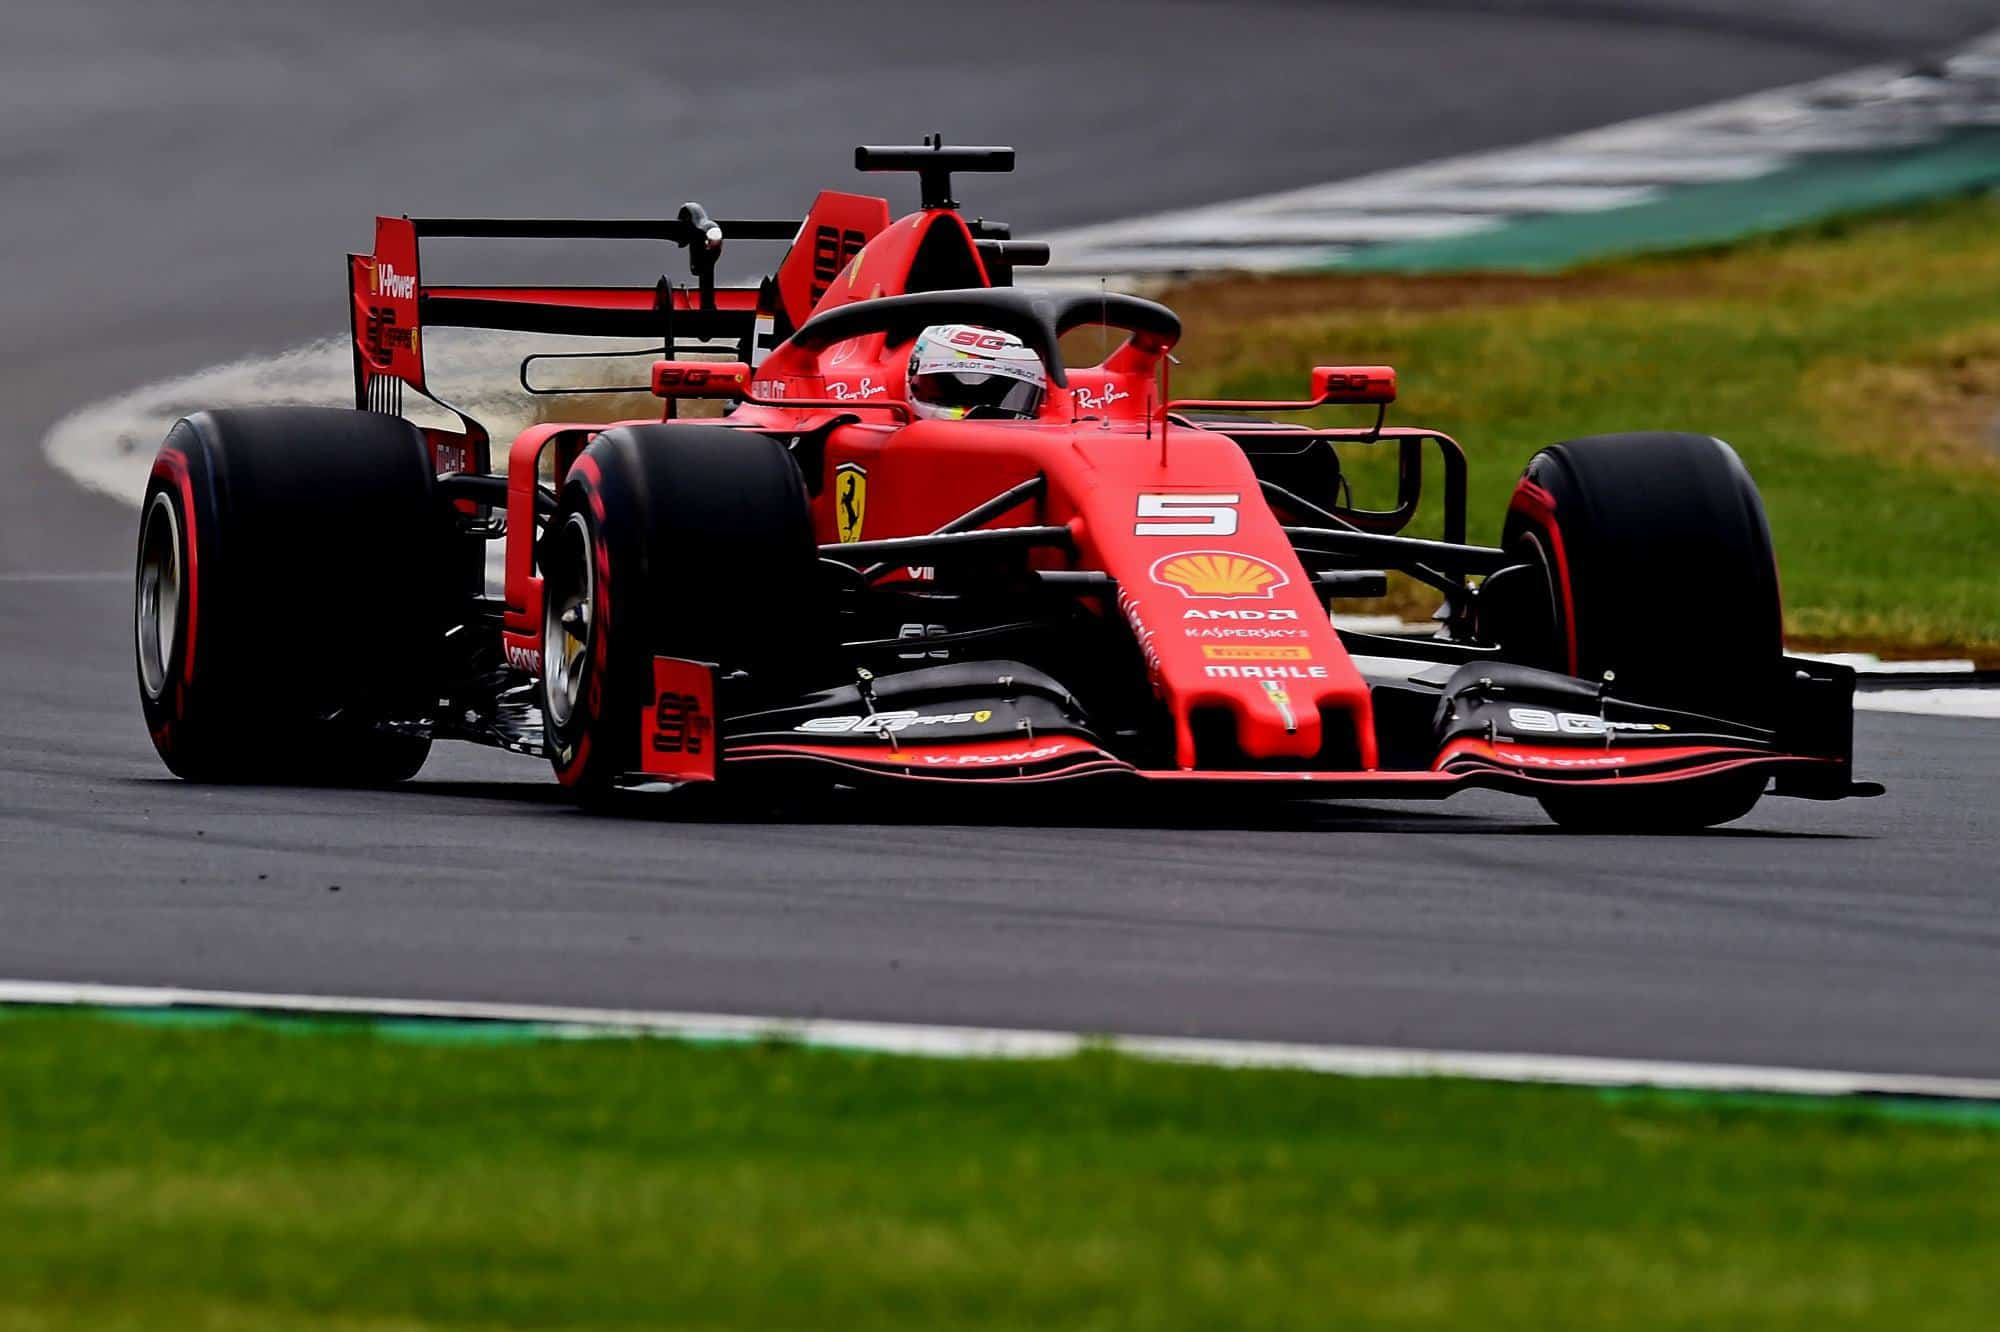 Sebastian Vettel Ferrari British GP F1 2019 DRS open Photo Ferrari